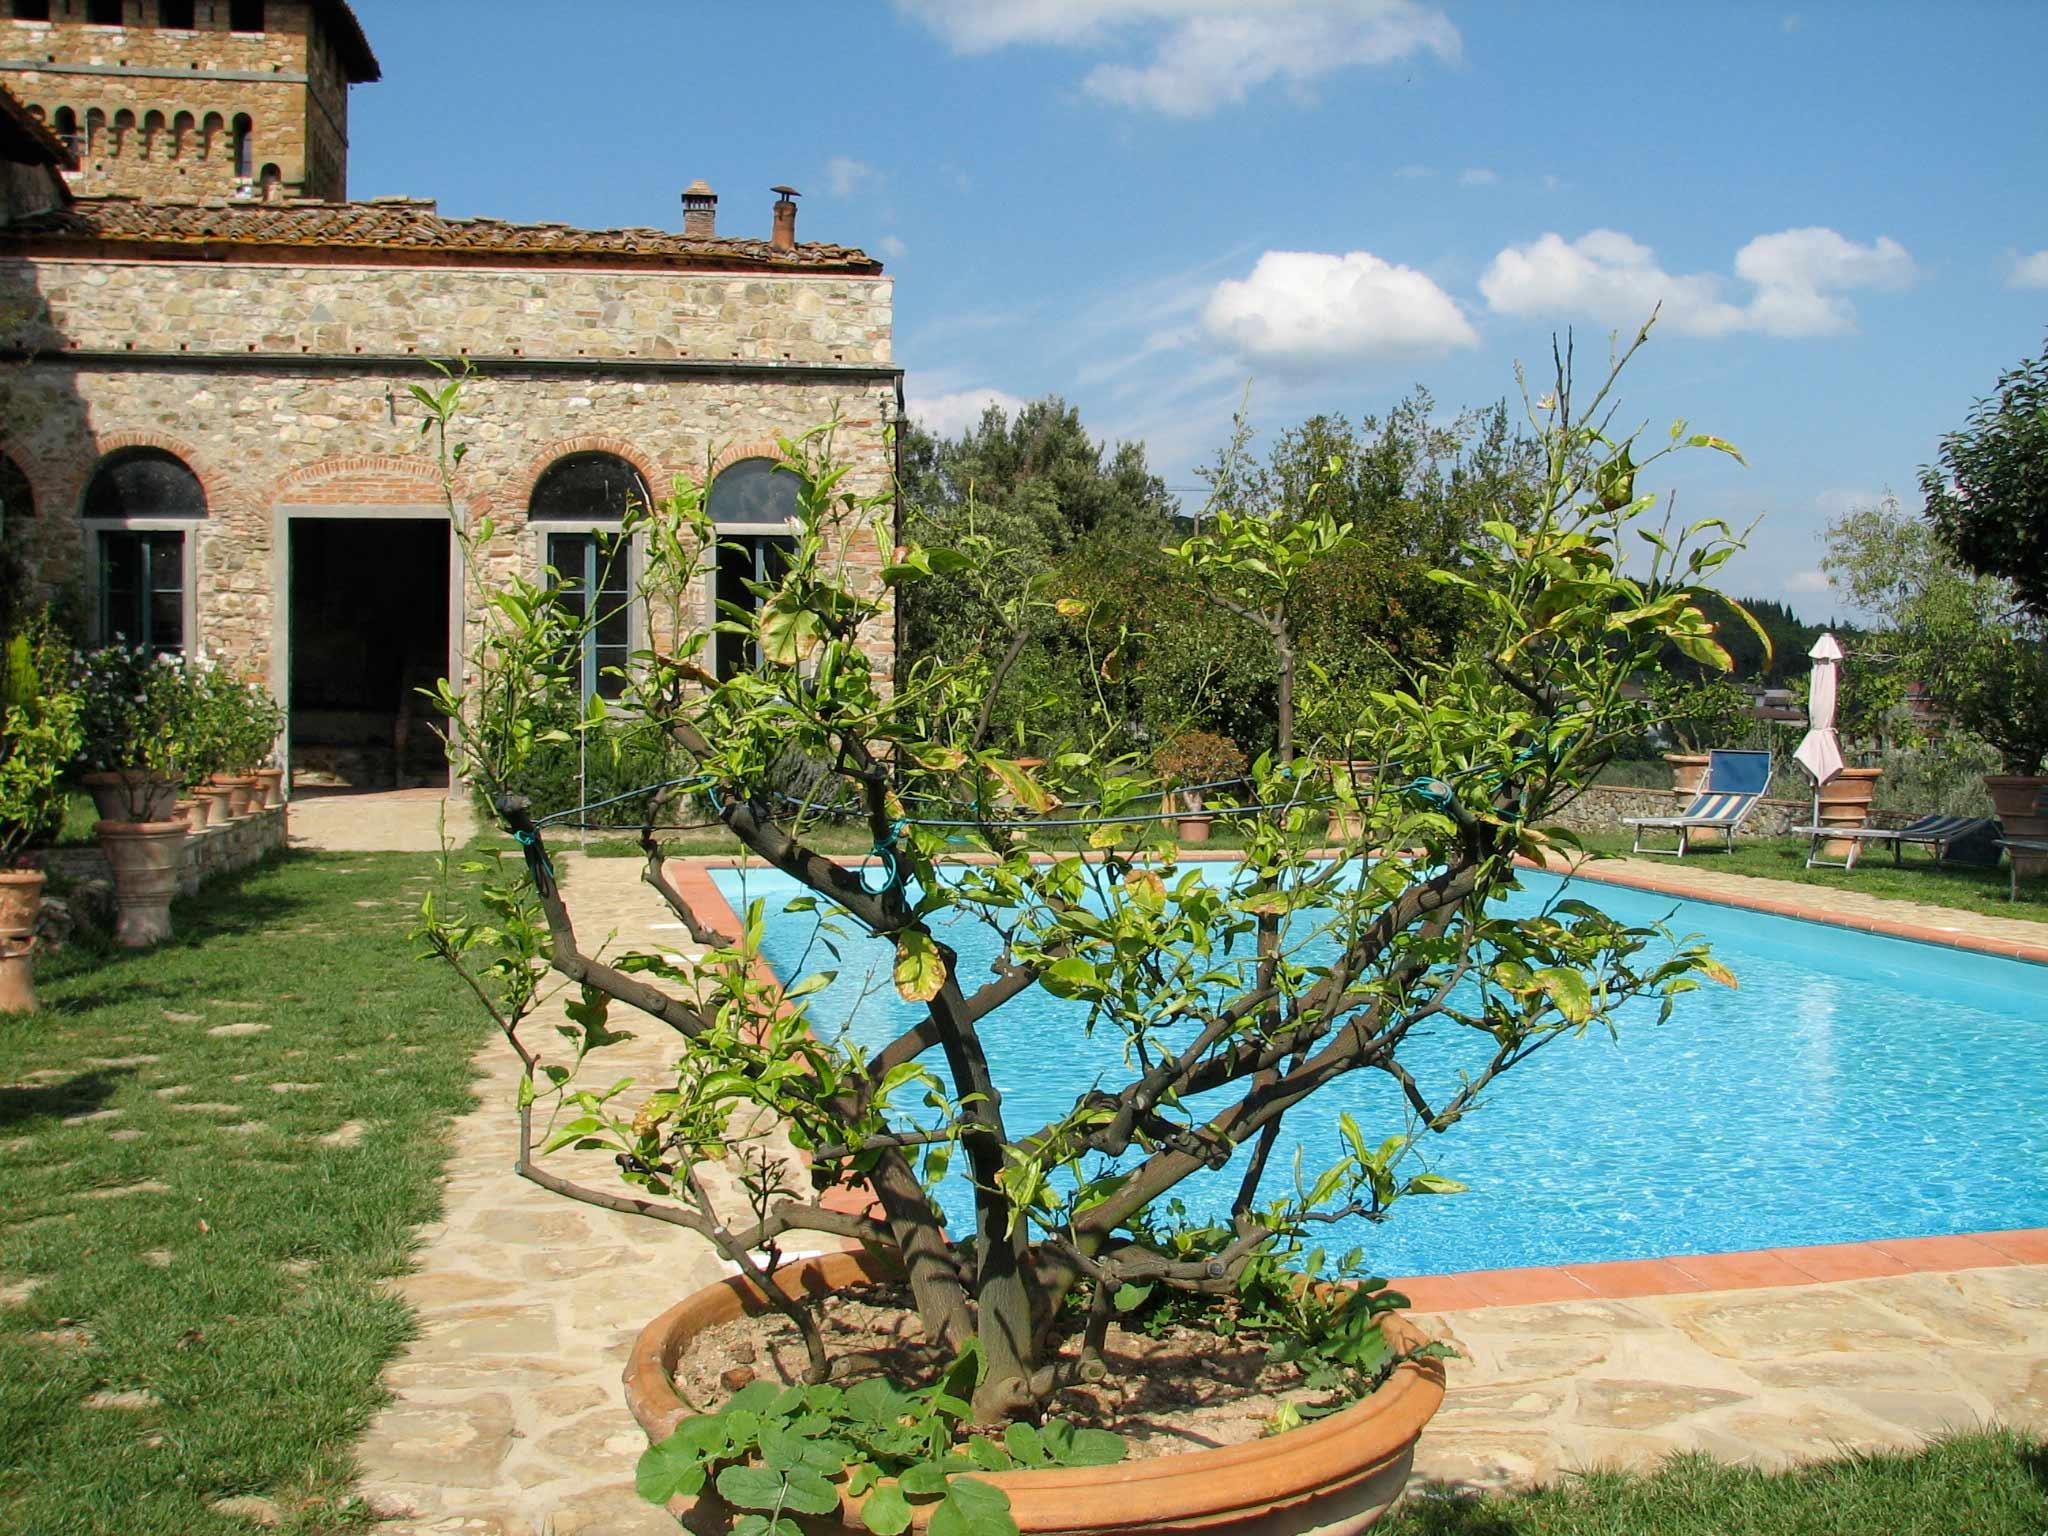 Piscina agriturismo firenze design e idee - Agriturismo napoli con piscina ...